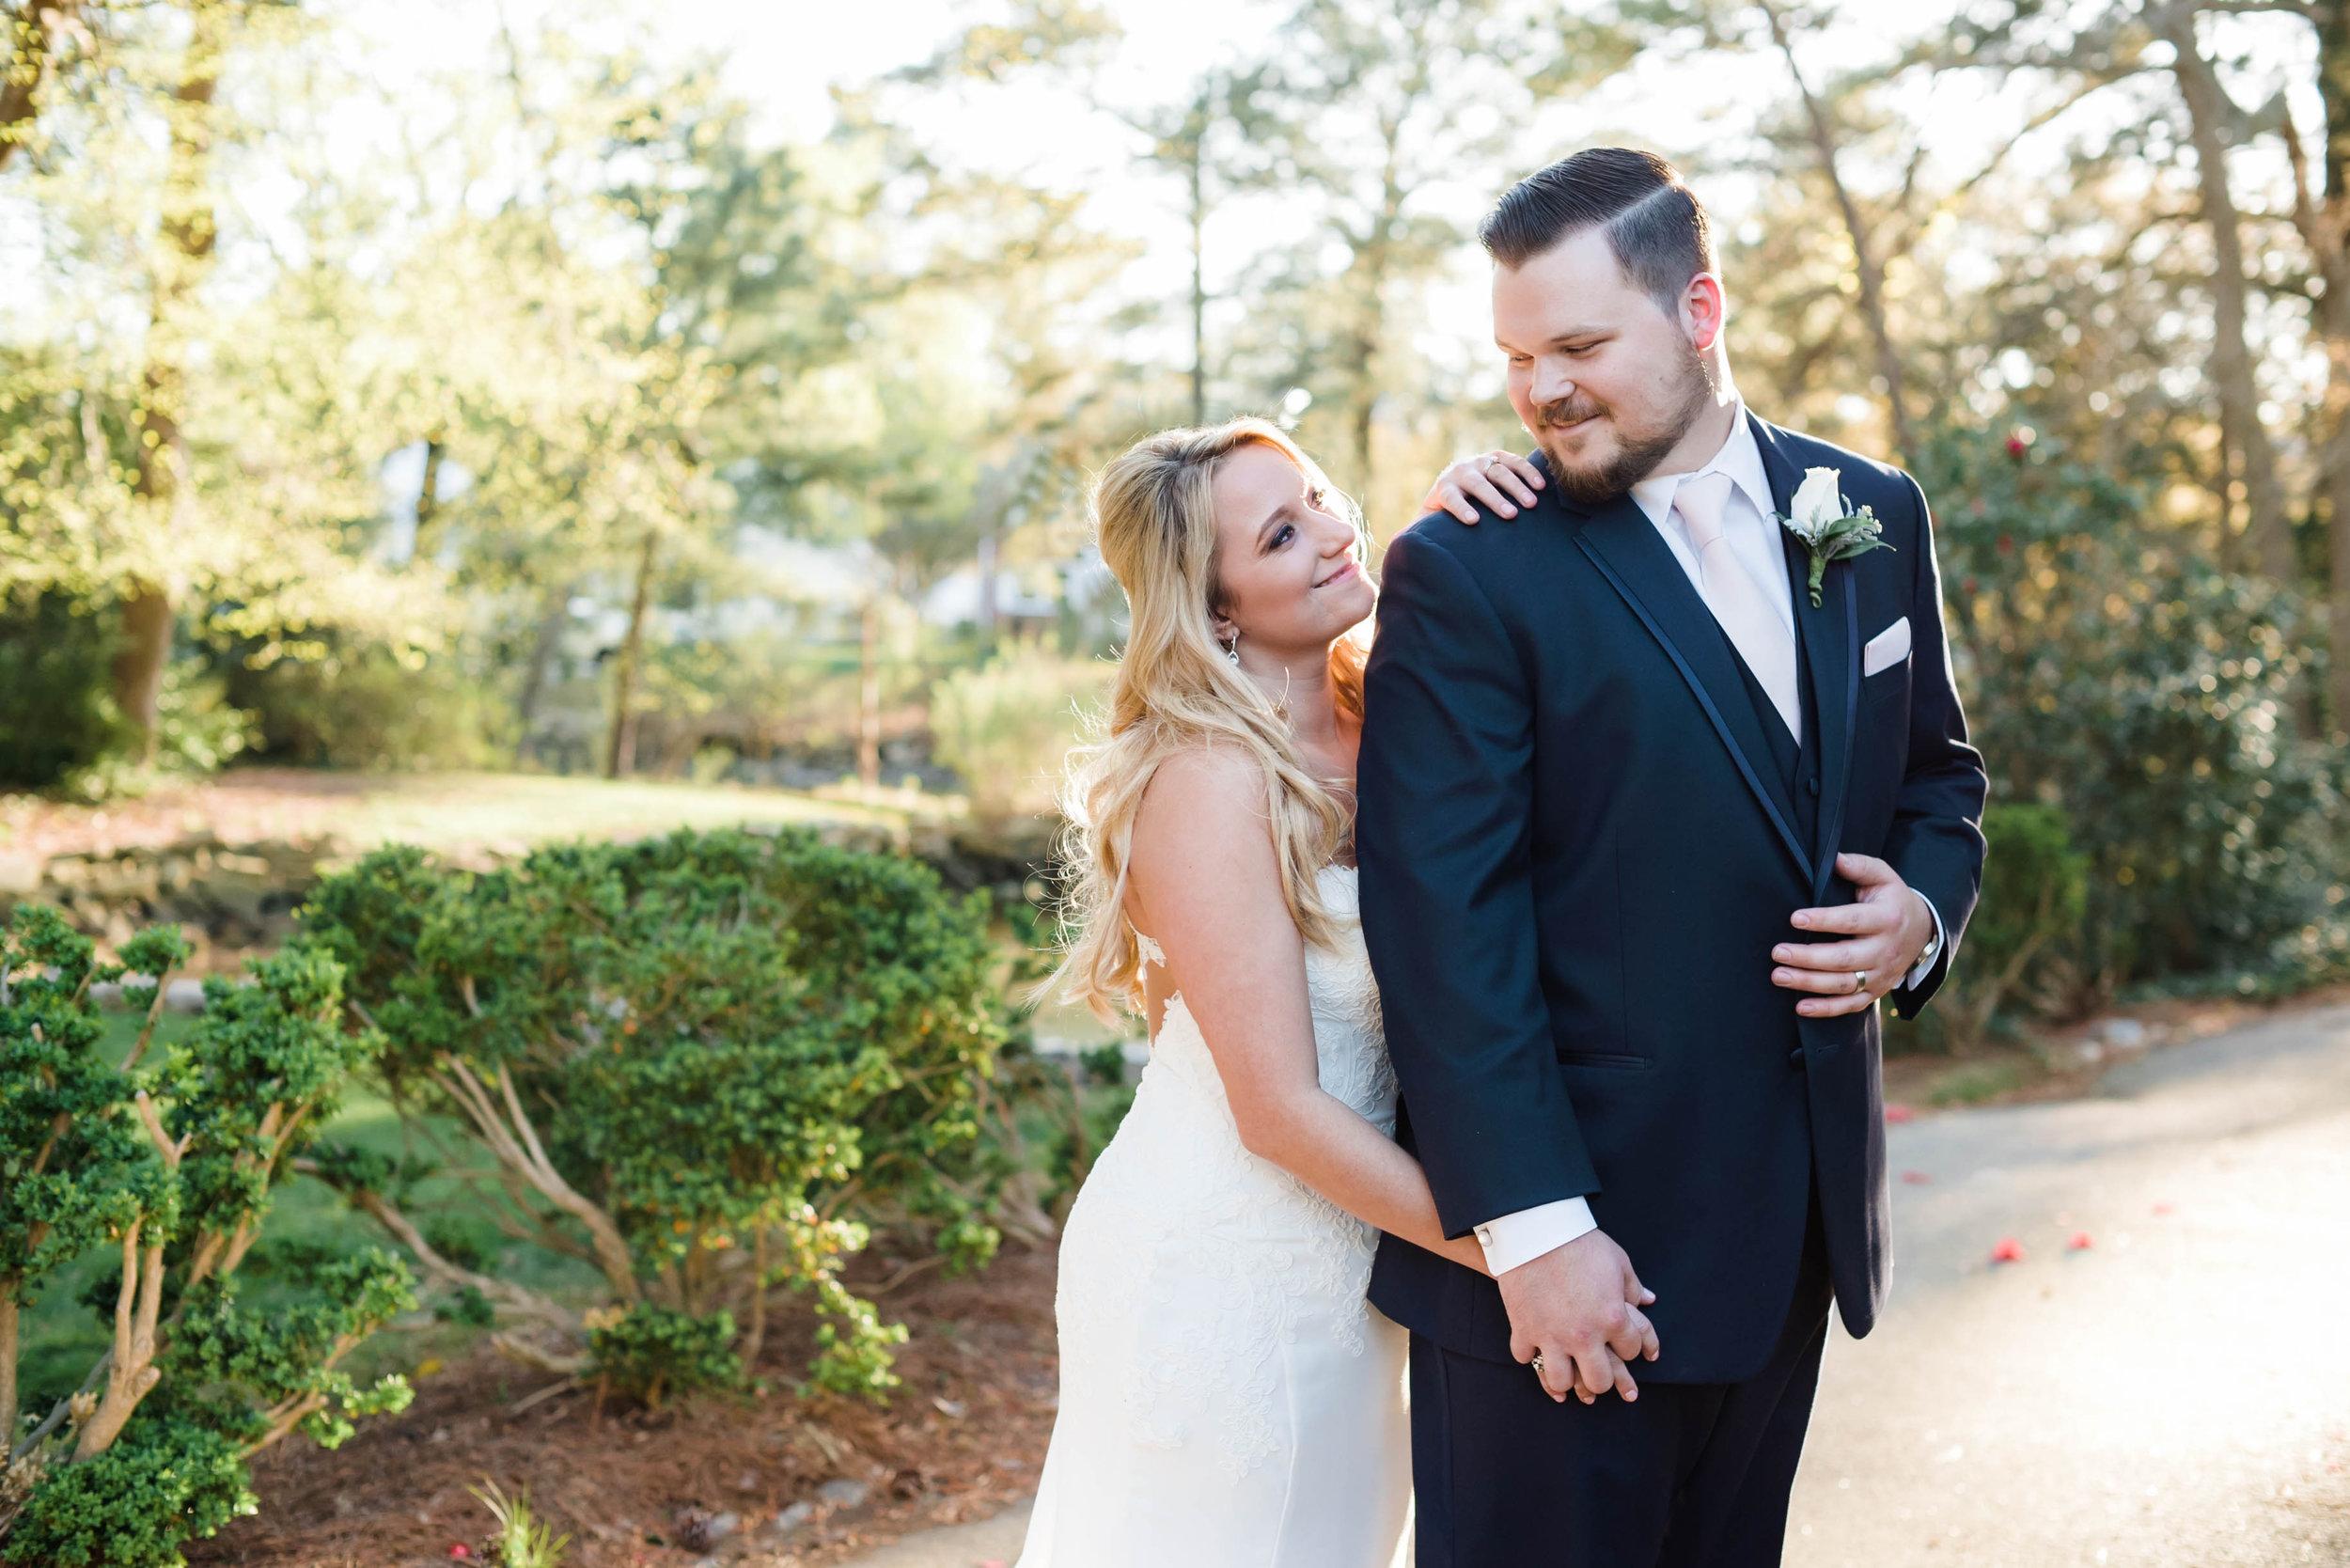 Will Hawkins Photography, Virginia Wedding Photographer, Virginia Beach Wedding Phootgrapher, Destination Wedding Photographer (283 of 506).jpg